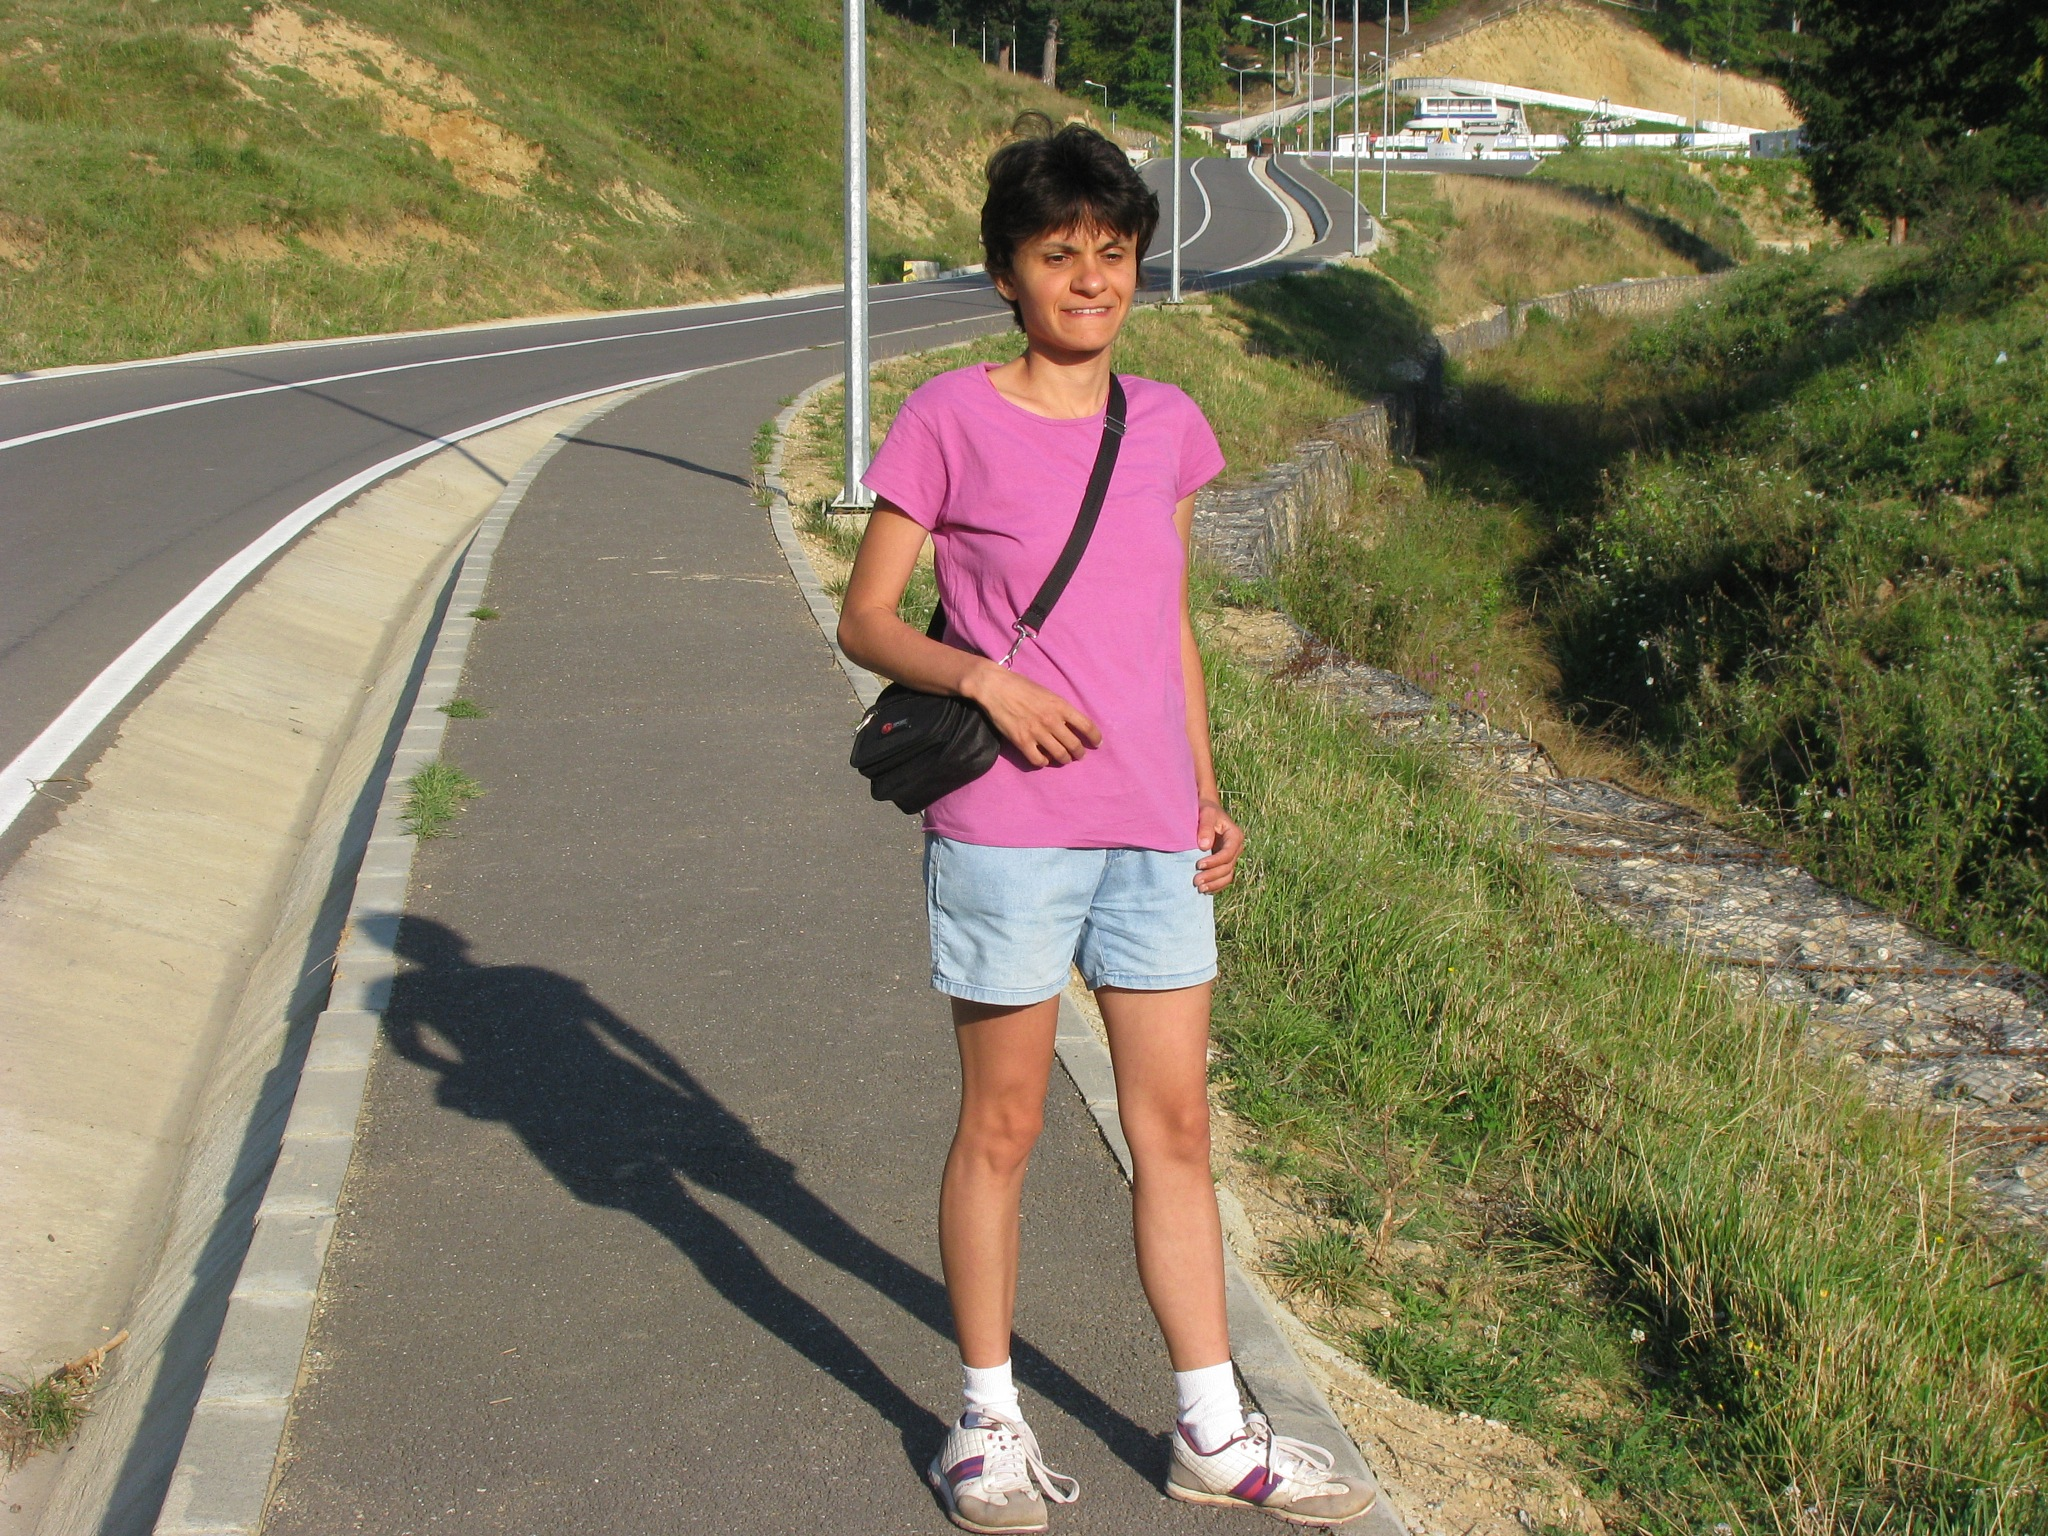 Me, at Rasnov resort, august 2014 by Elena Maria